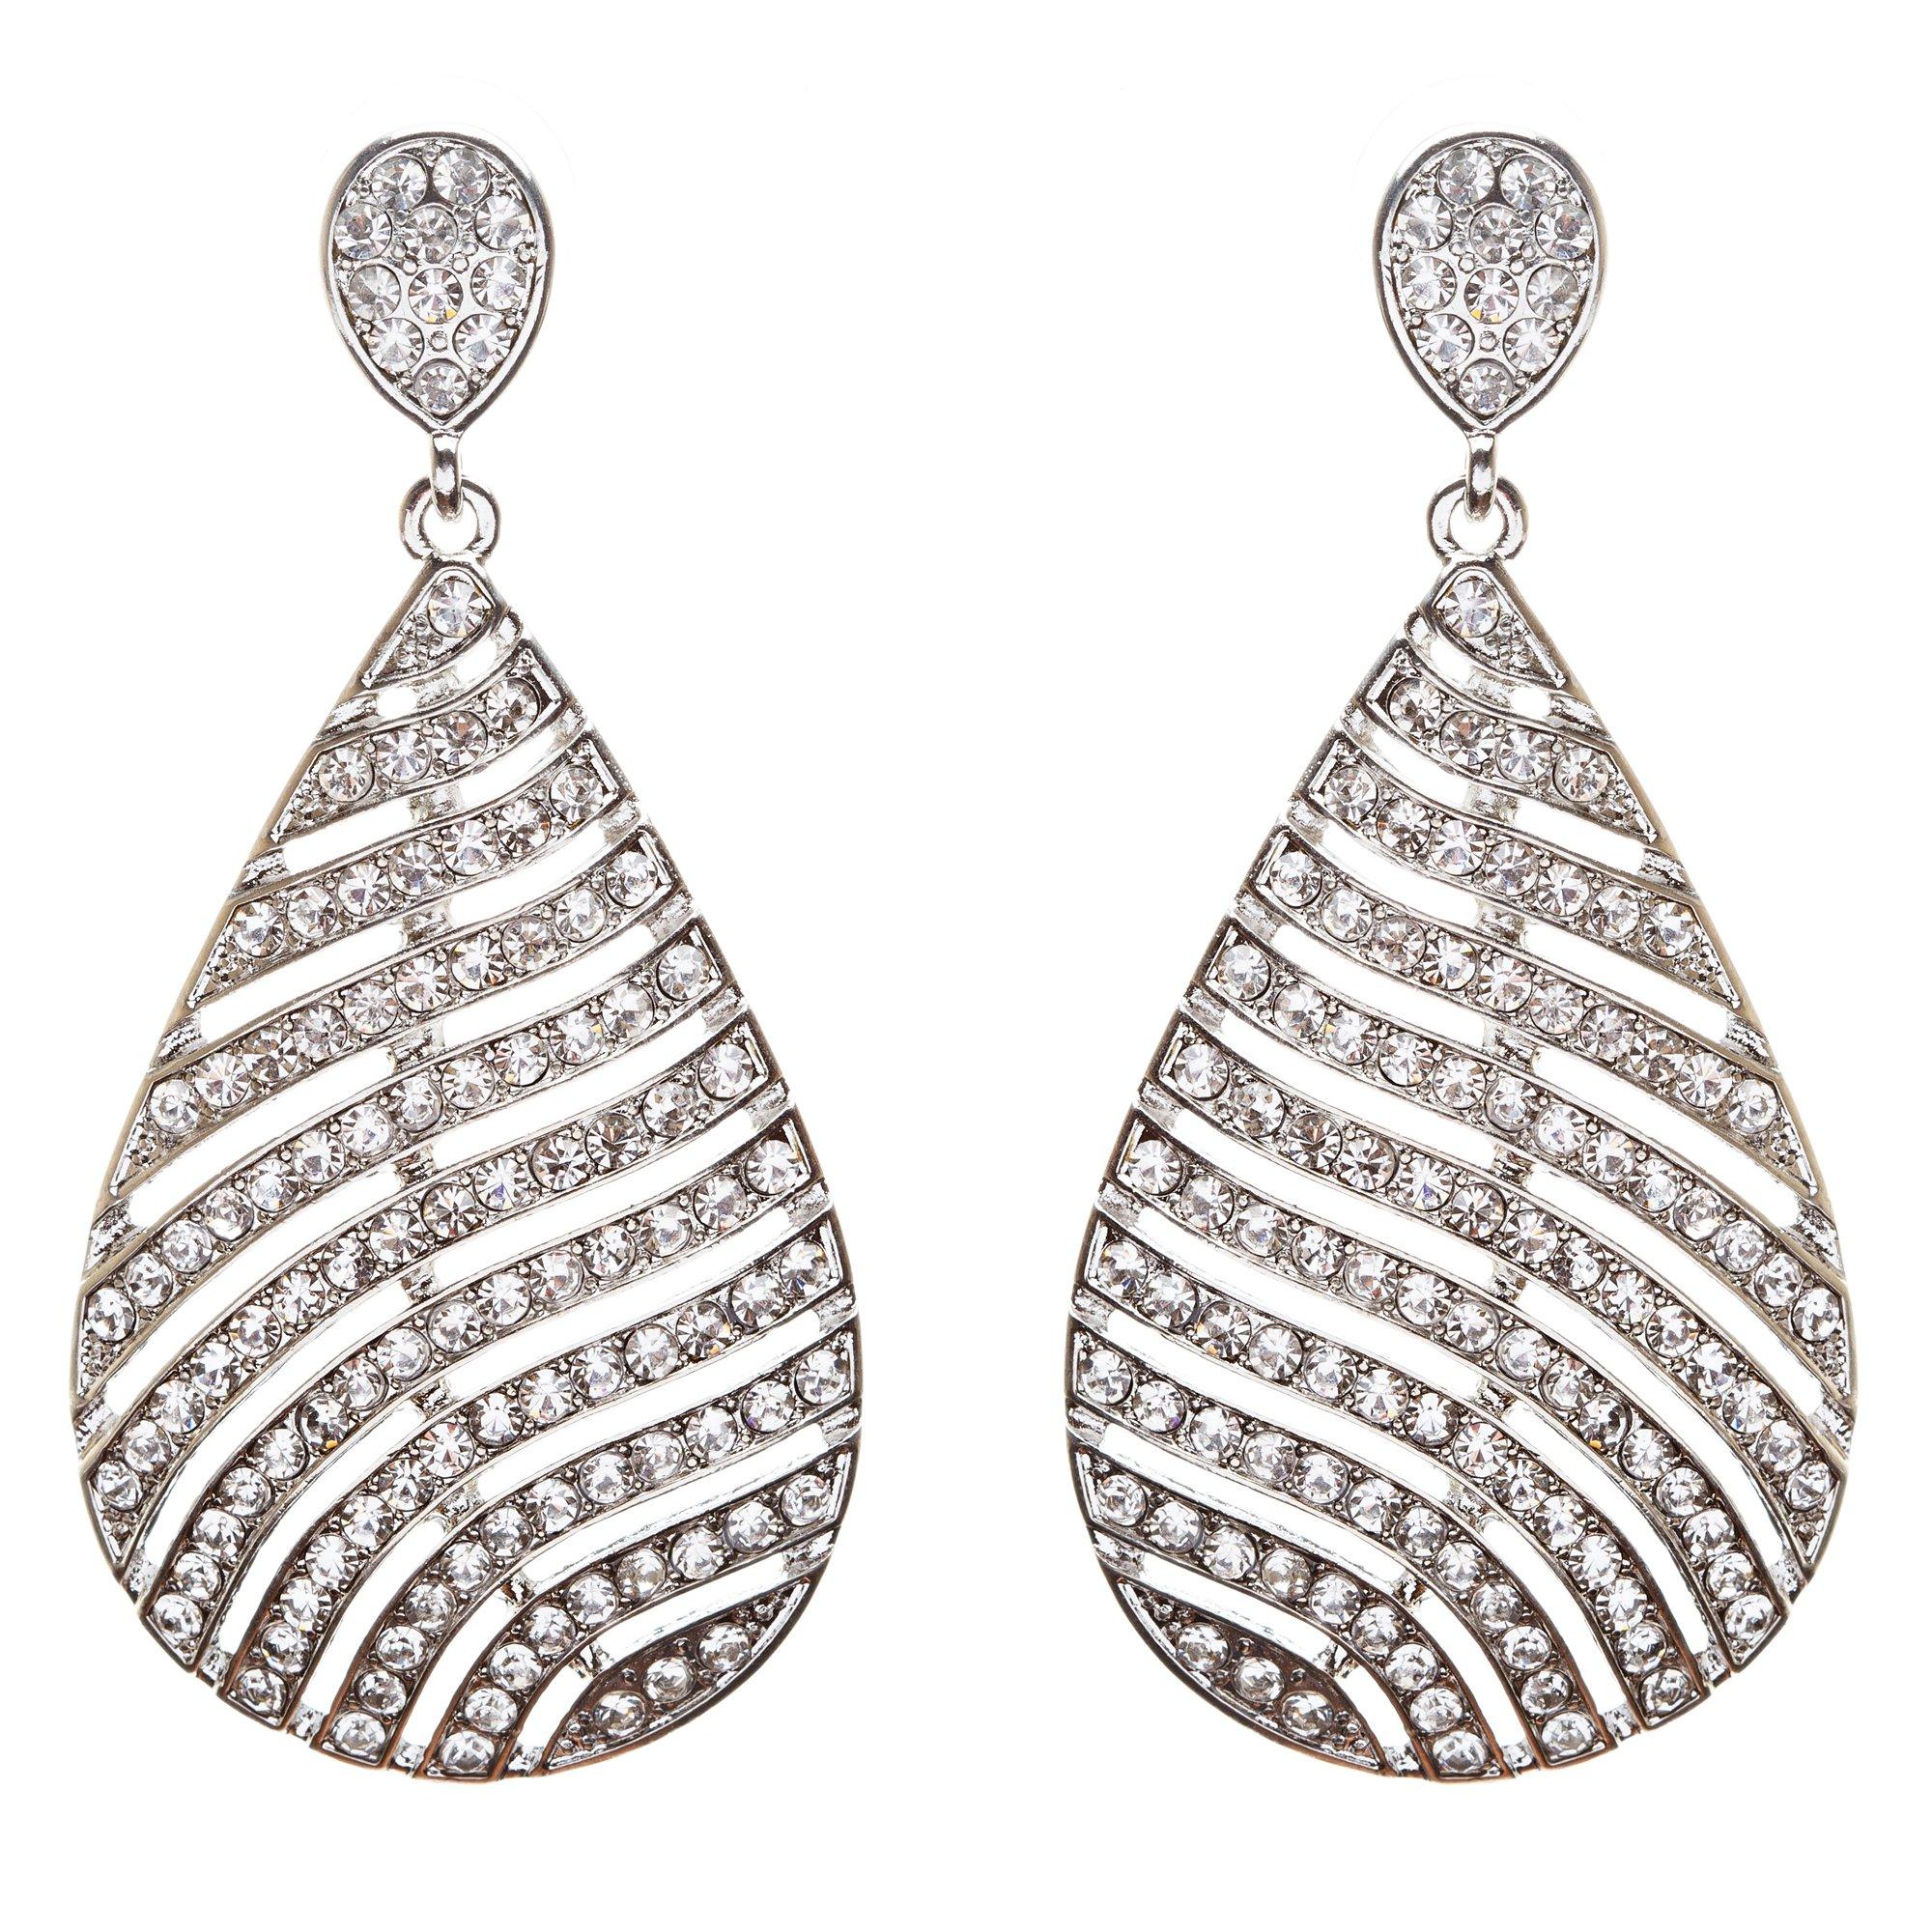 ACCESSORIESFOREVER Women Modern Fashion Crystal Rhinestone Stunning Leaf Design Dangle Earrings E729 SLVR